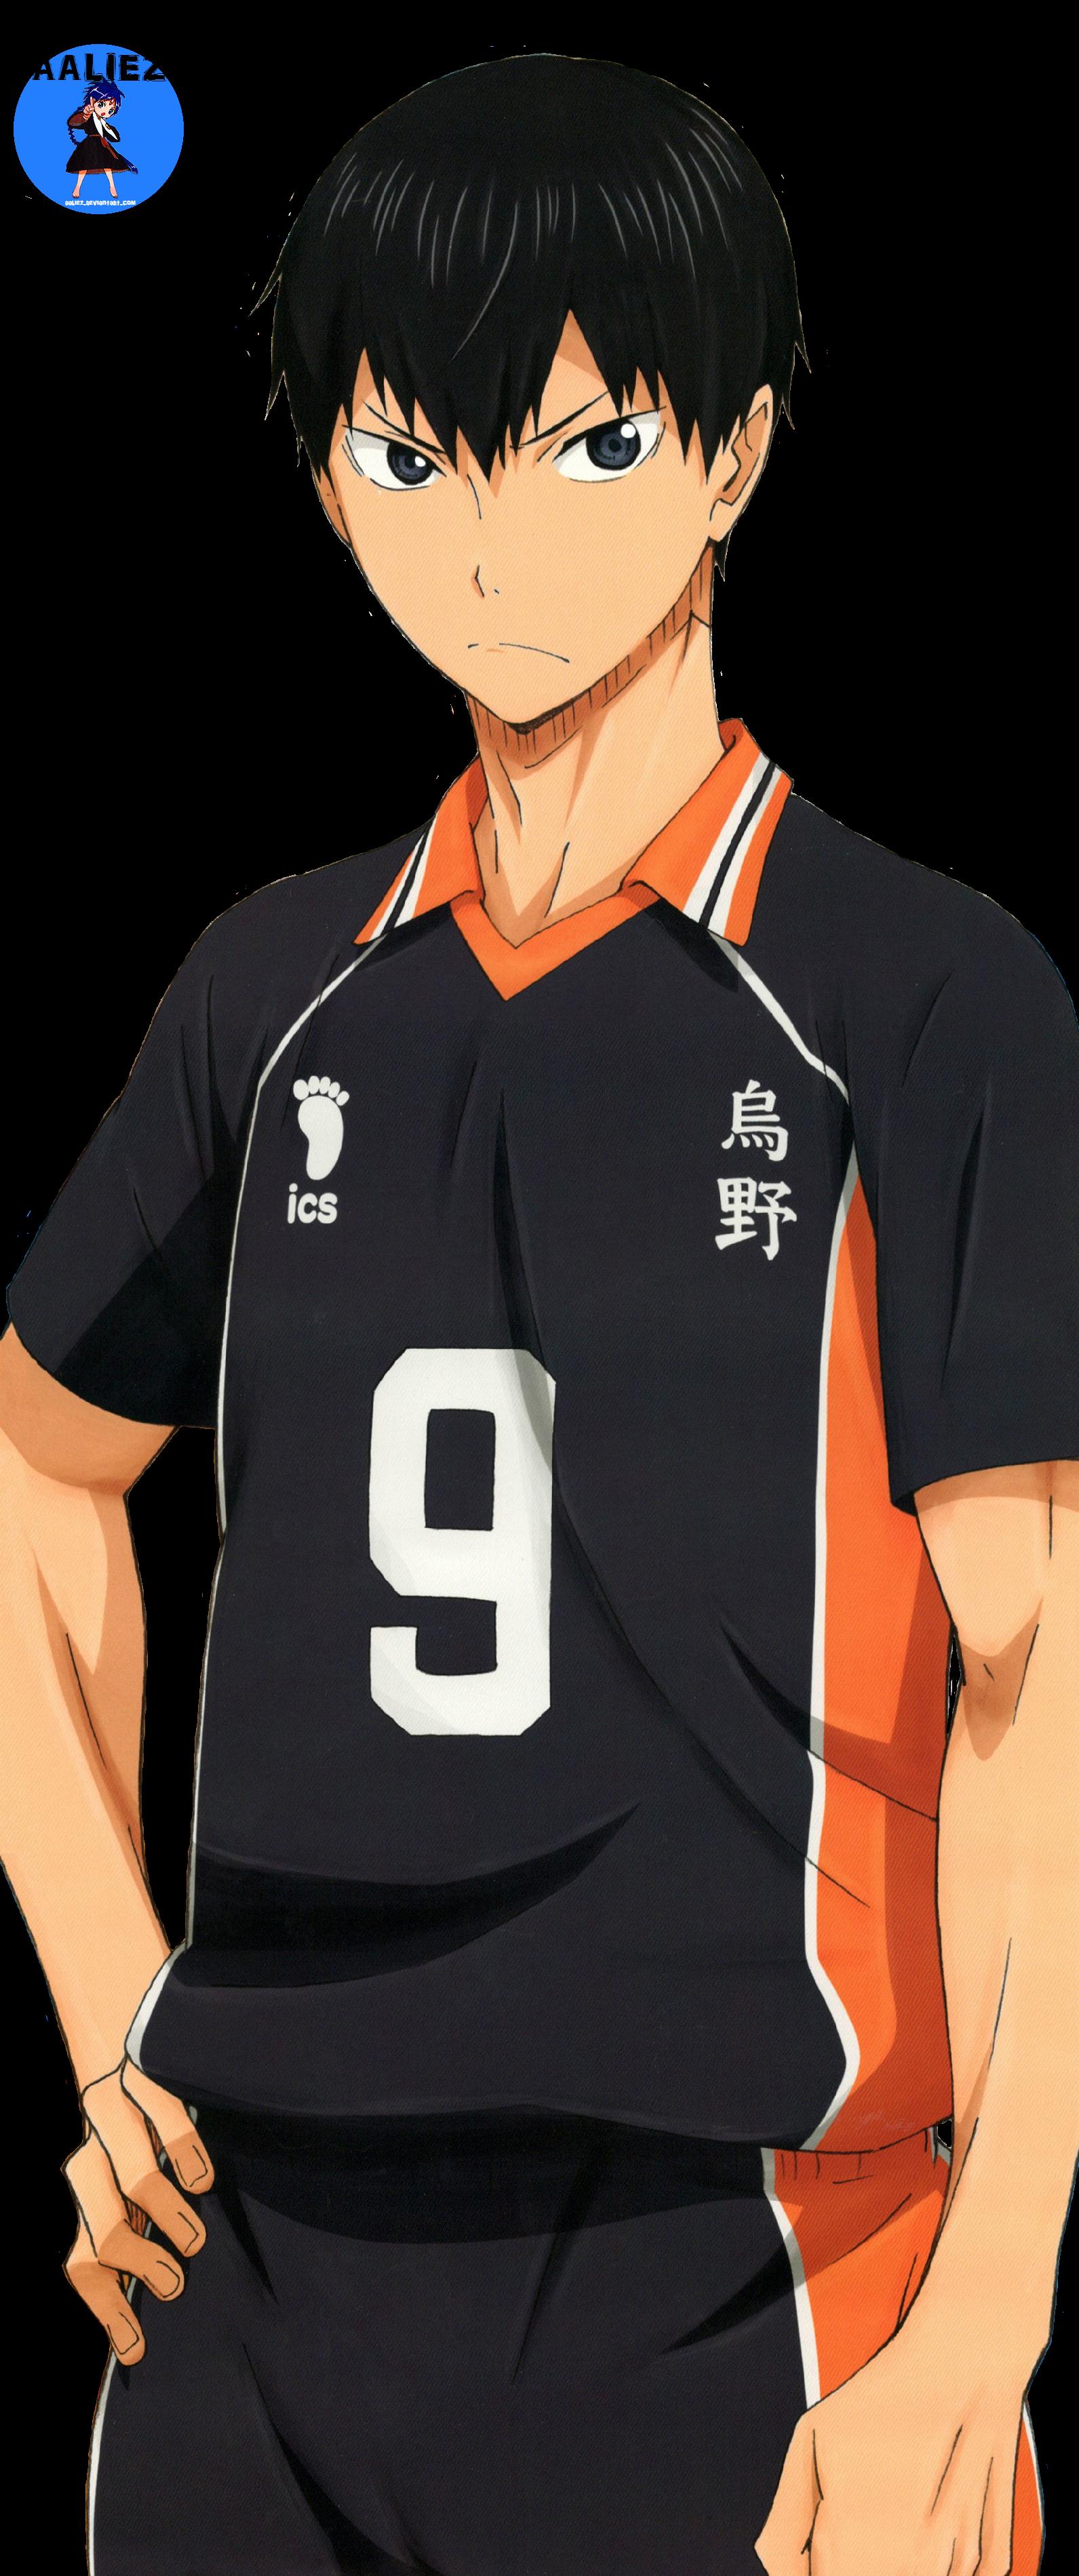 kageyama tobio height